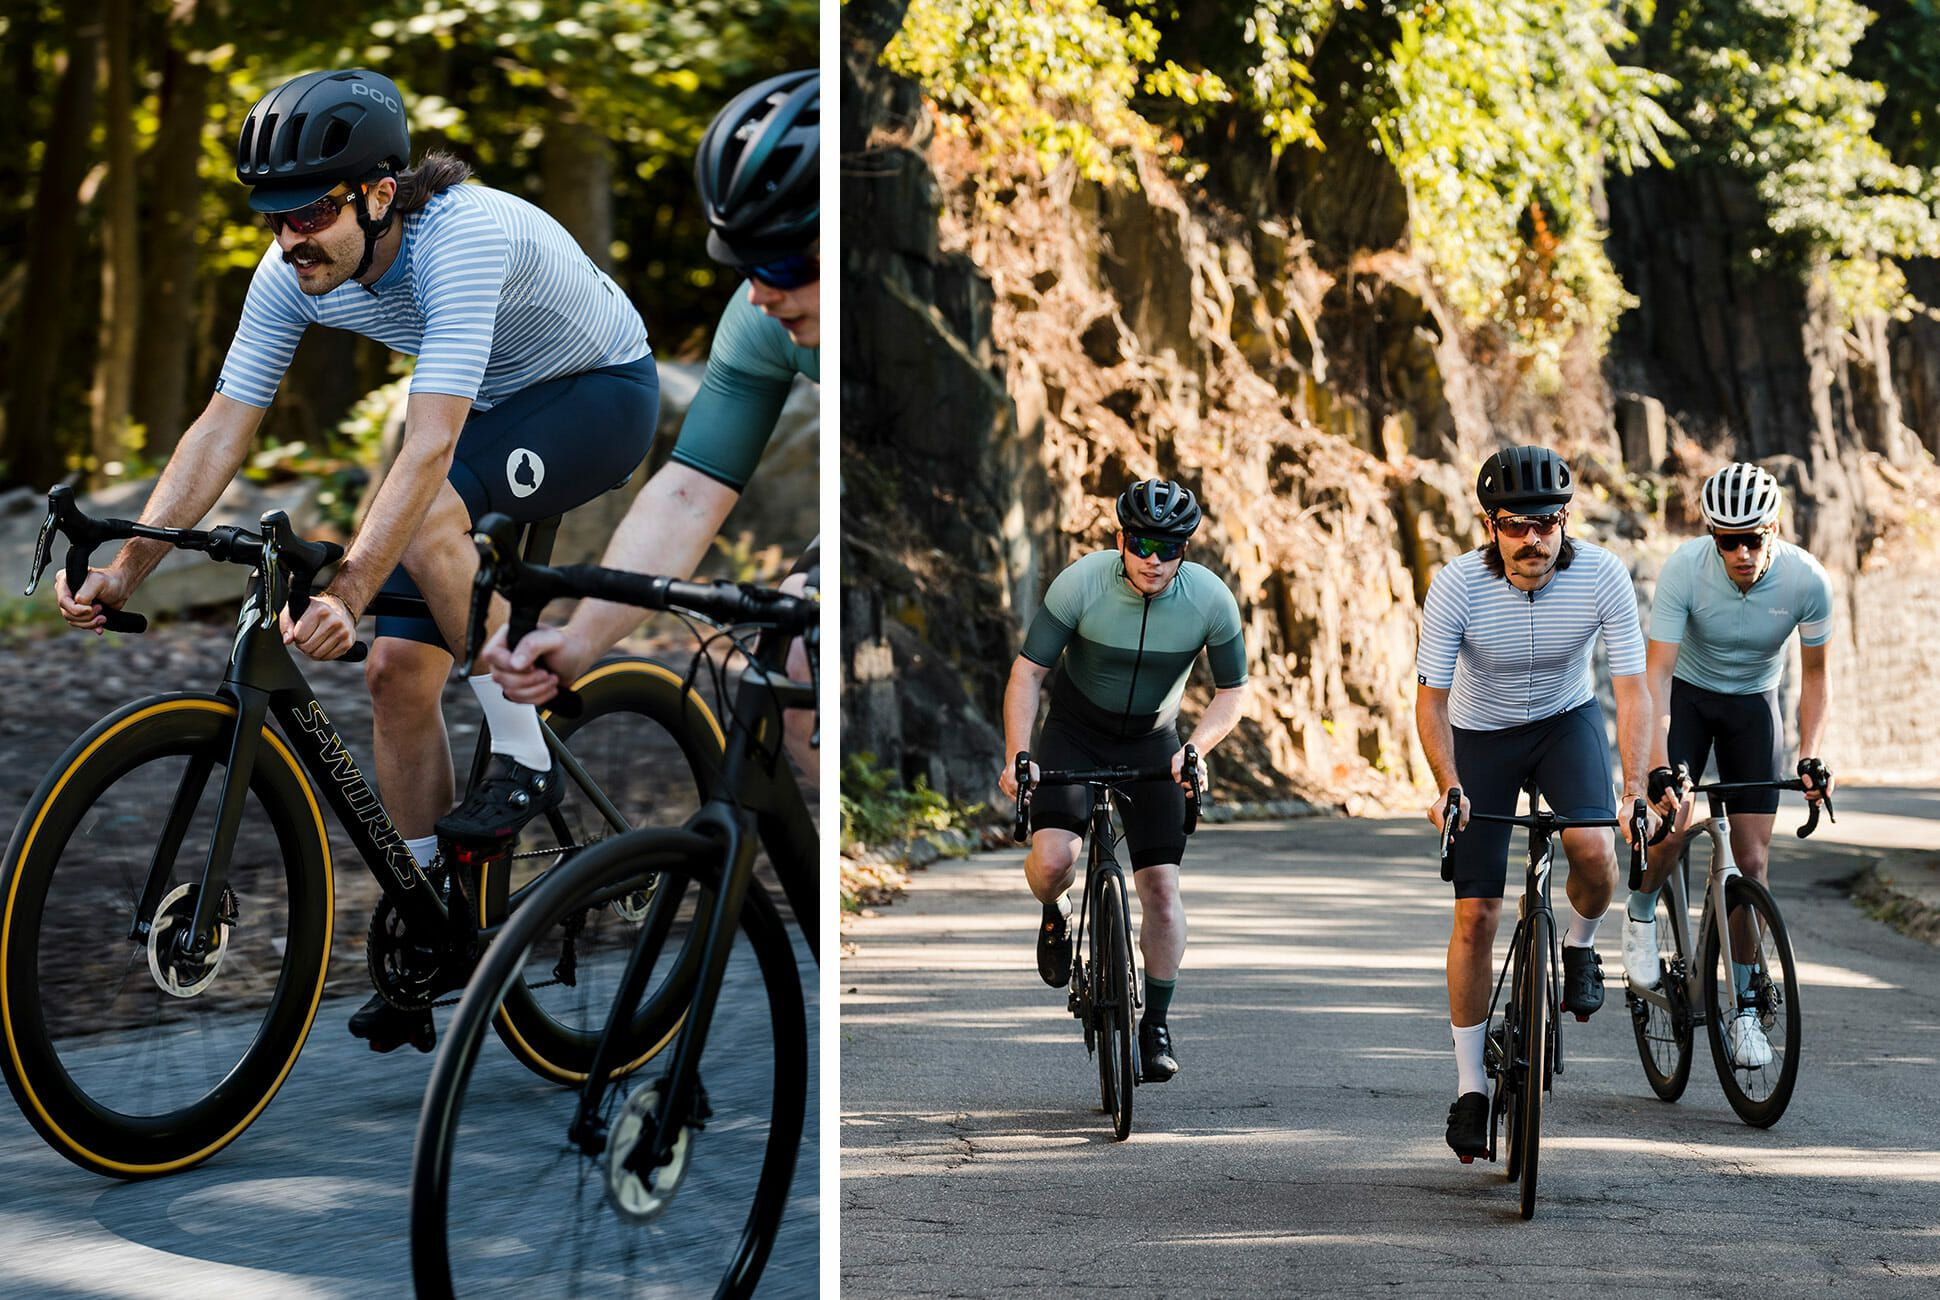 Summer-Cycling-Kits-2018-gear-patrol-ctb-slide-3